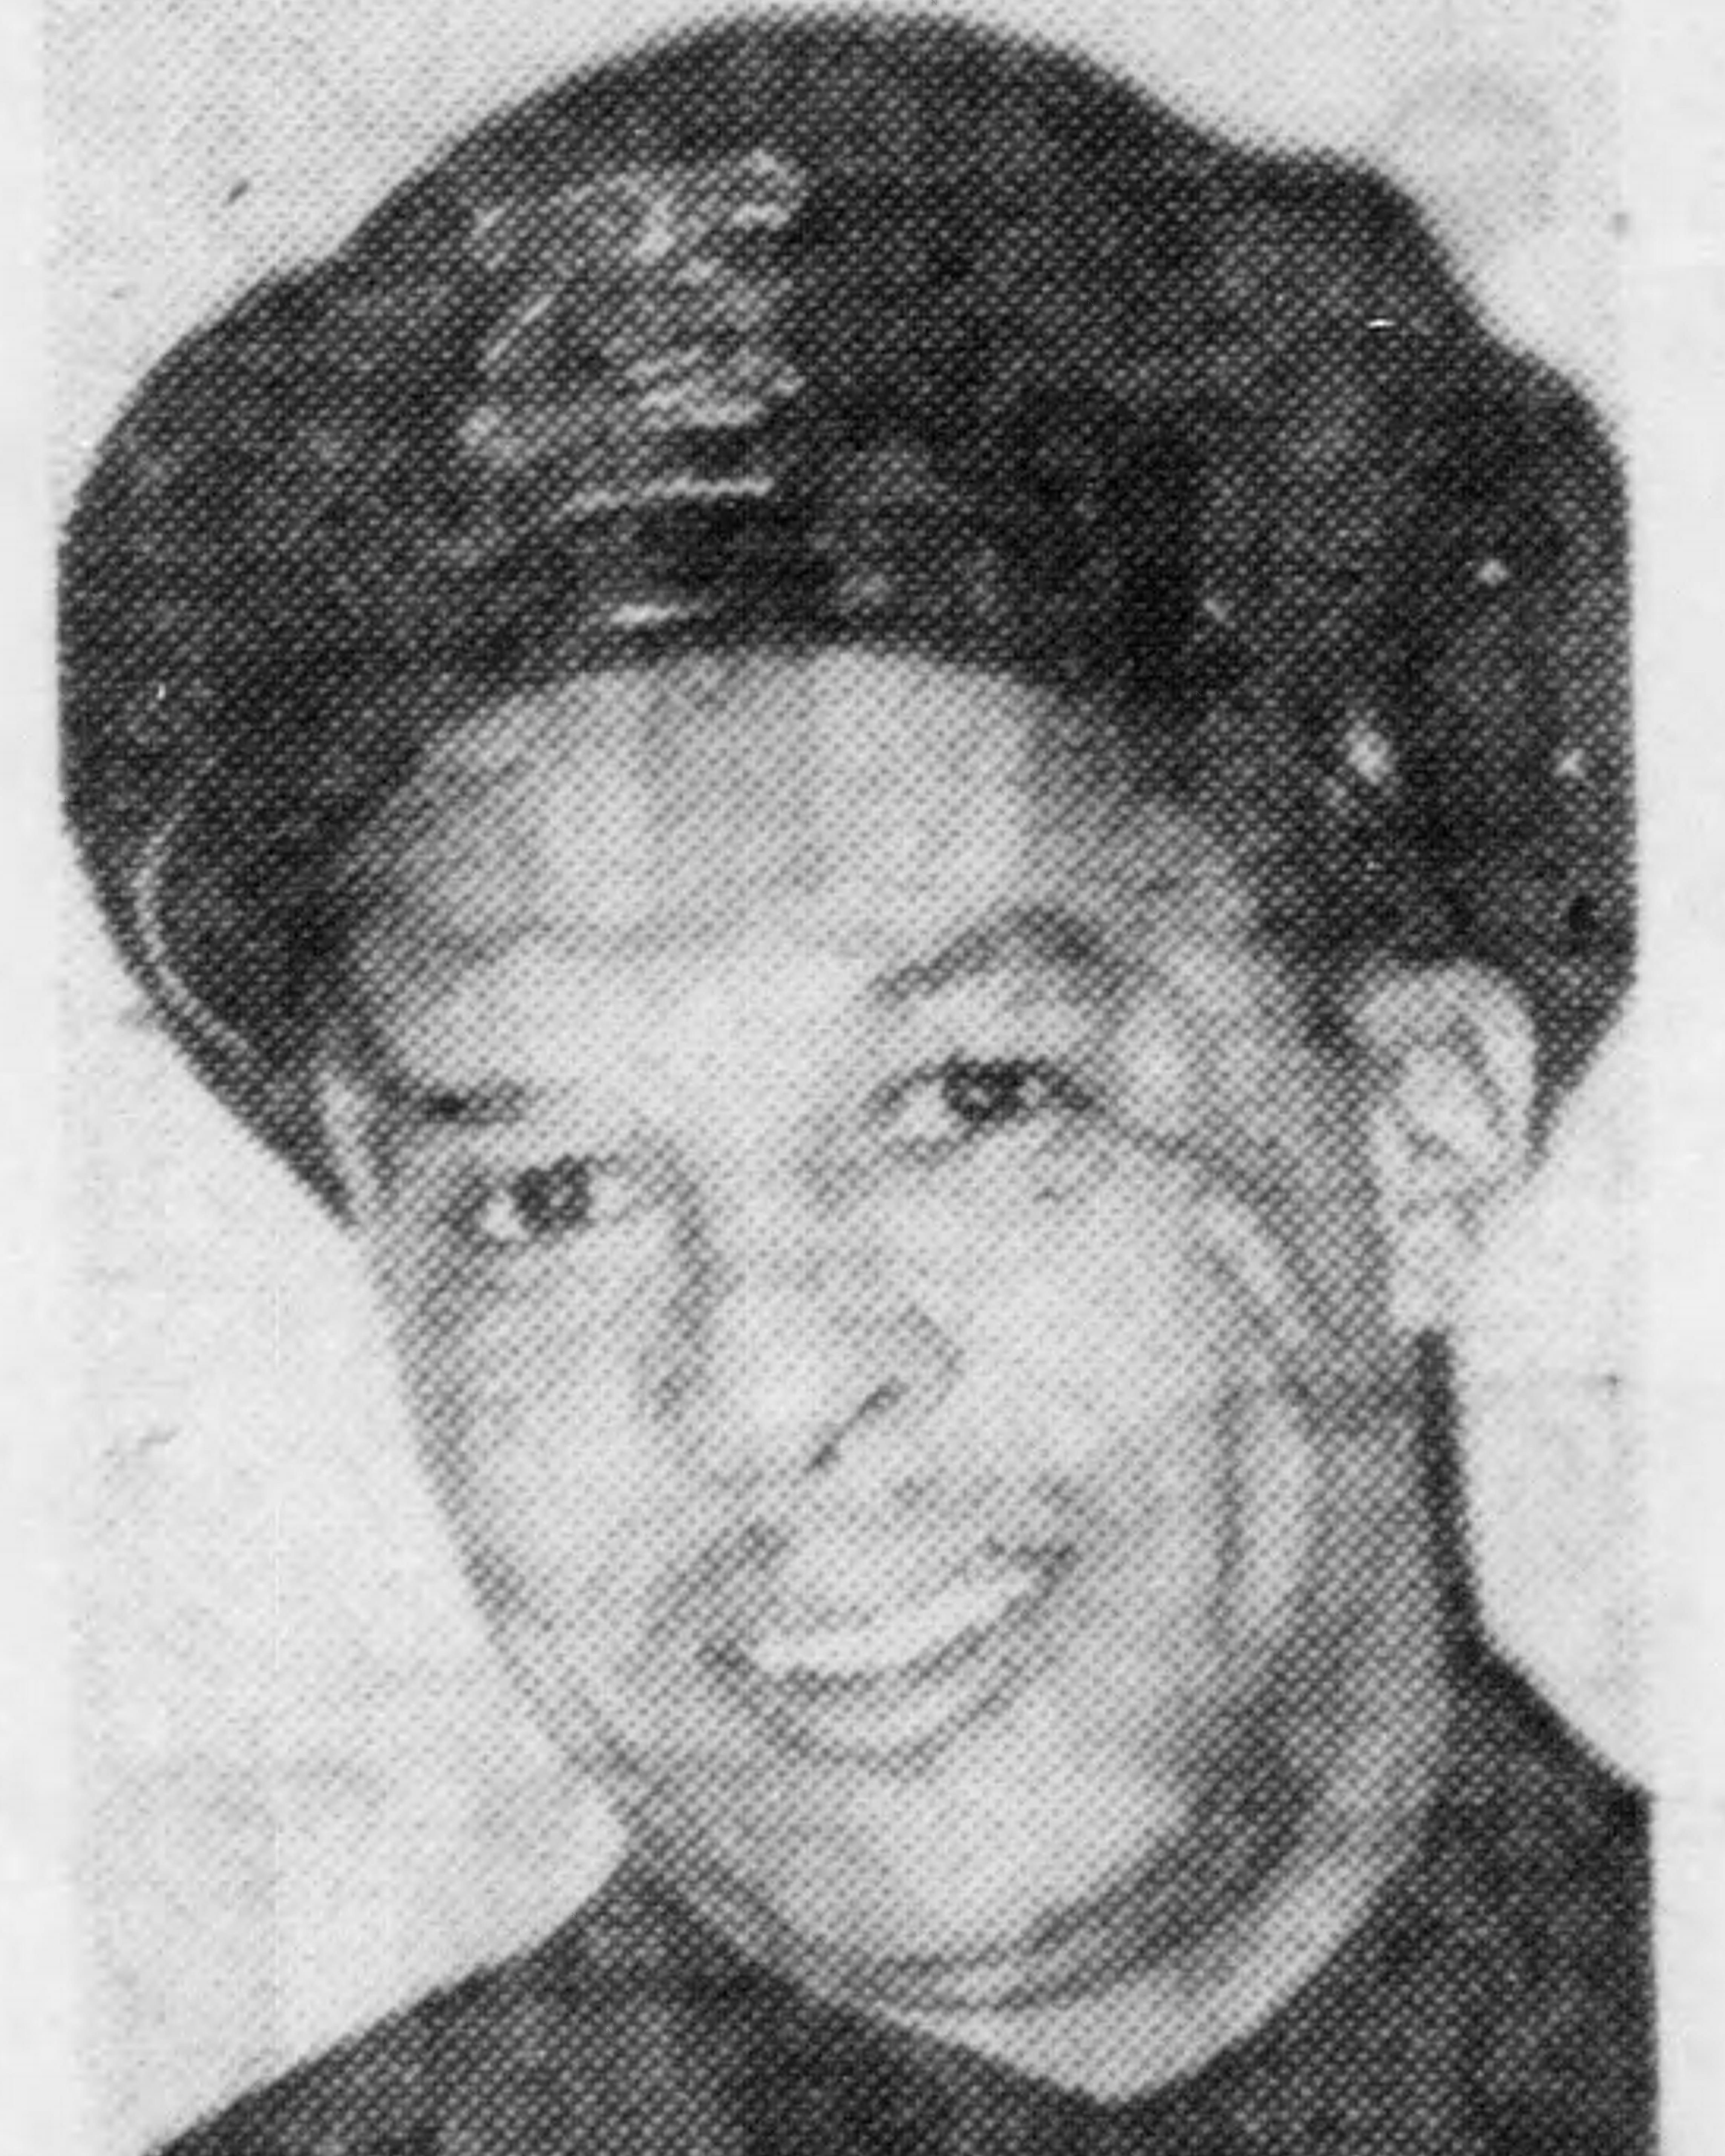 Sergeant James Gatewood, Jr. | Royal Oak Township Police Department, Michigan